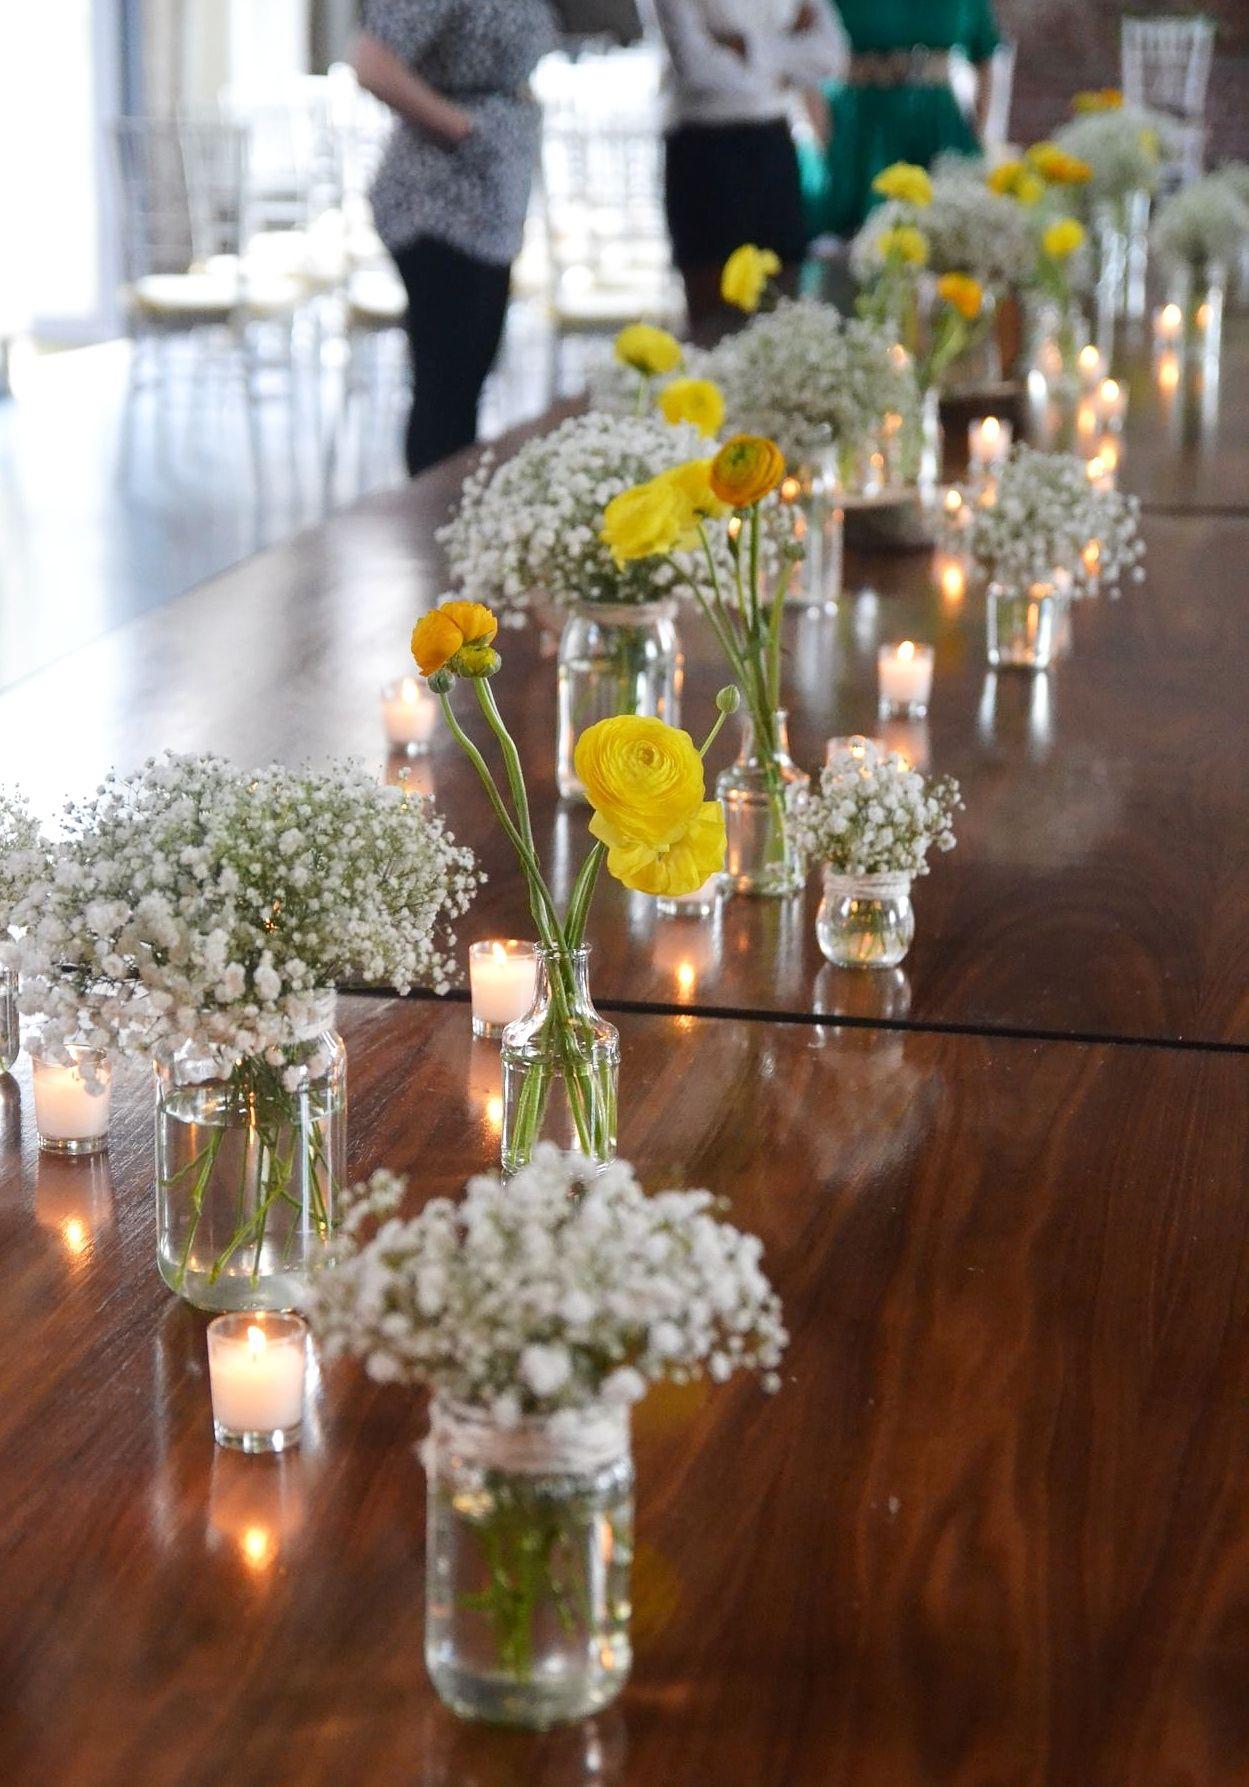 Bright yellow spring time ranunculus blooms in bud vases and bright yellow spring time ranunculus blooms in bud vases and bunches of babys breath in jars reviewsmspy